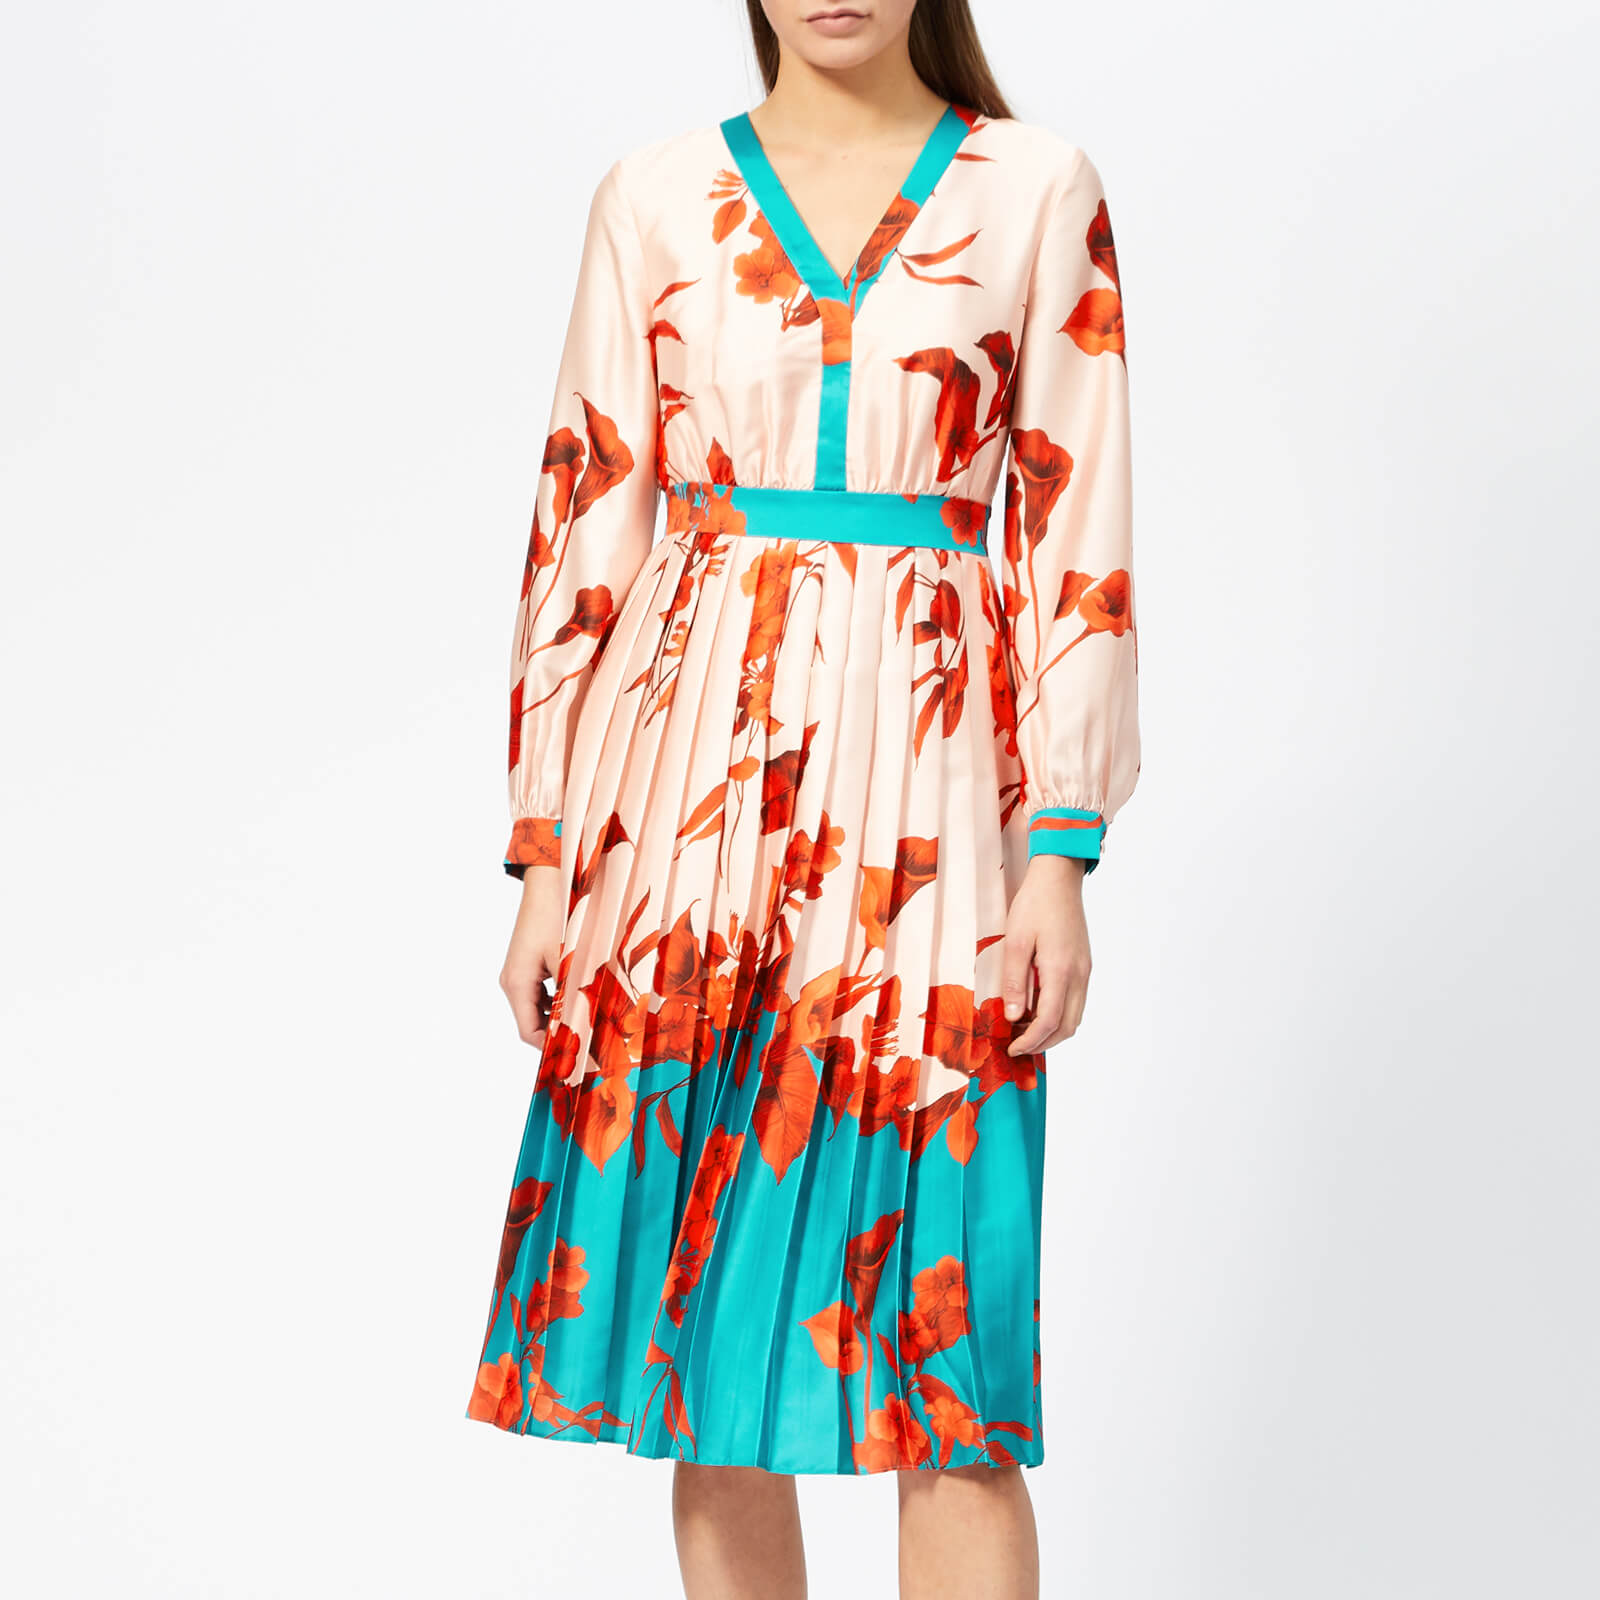 ca20d51d826e4c Ted Baker Women's Karolyn Fantasia Bow Neck Midi Dress - Pale Pink Womens  Clothing | TheHut.com